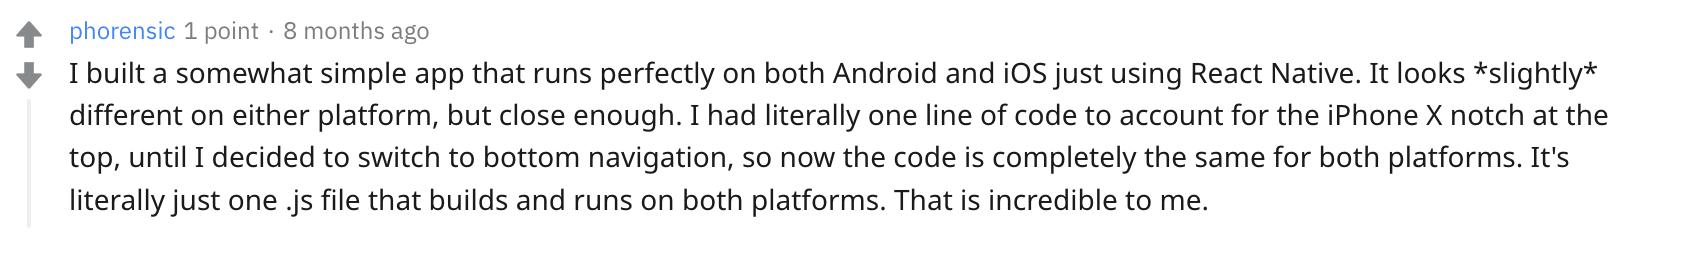 react native app development reddit